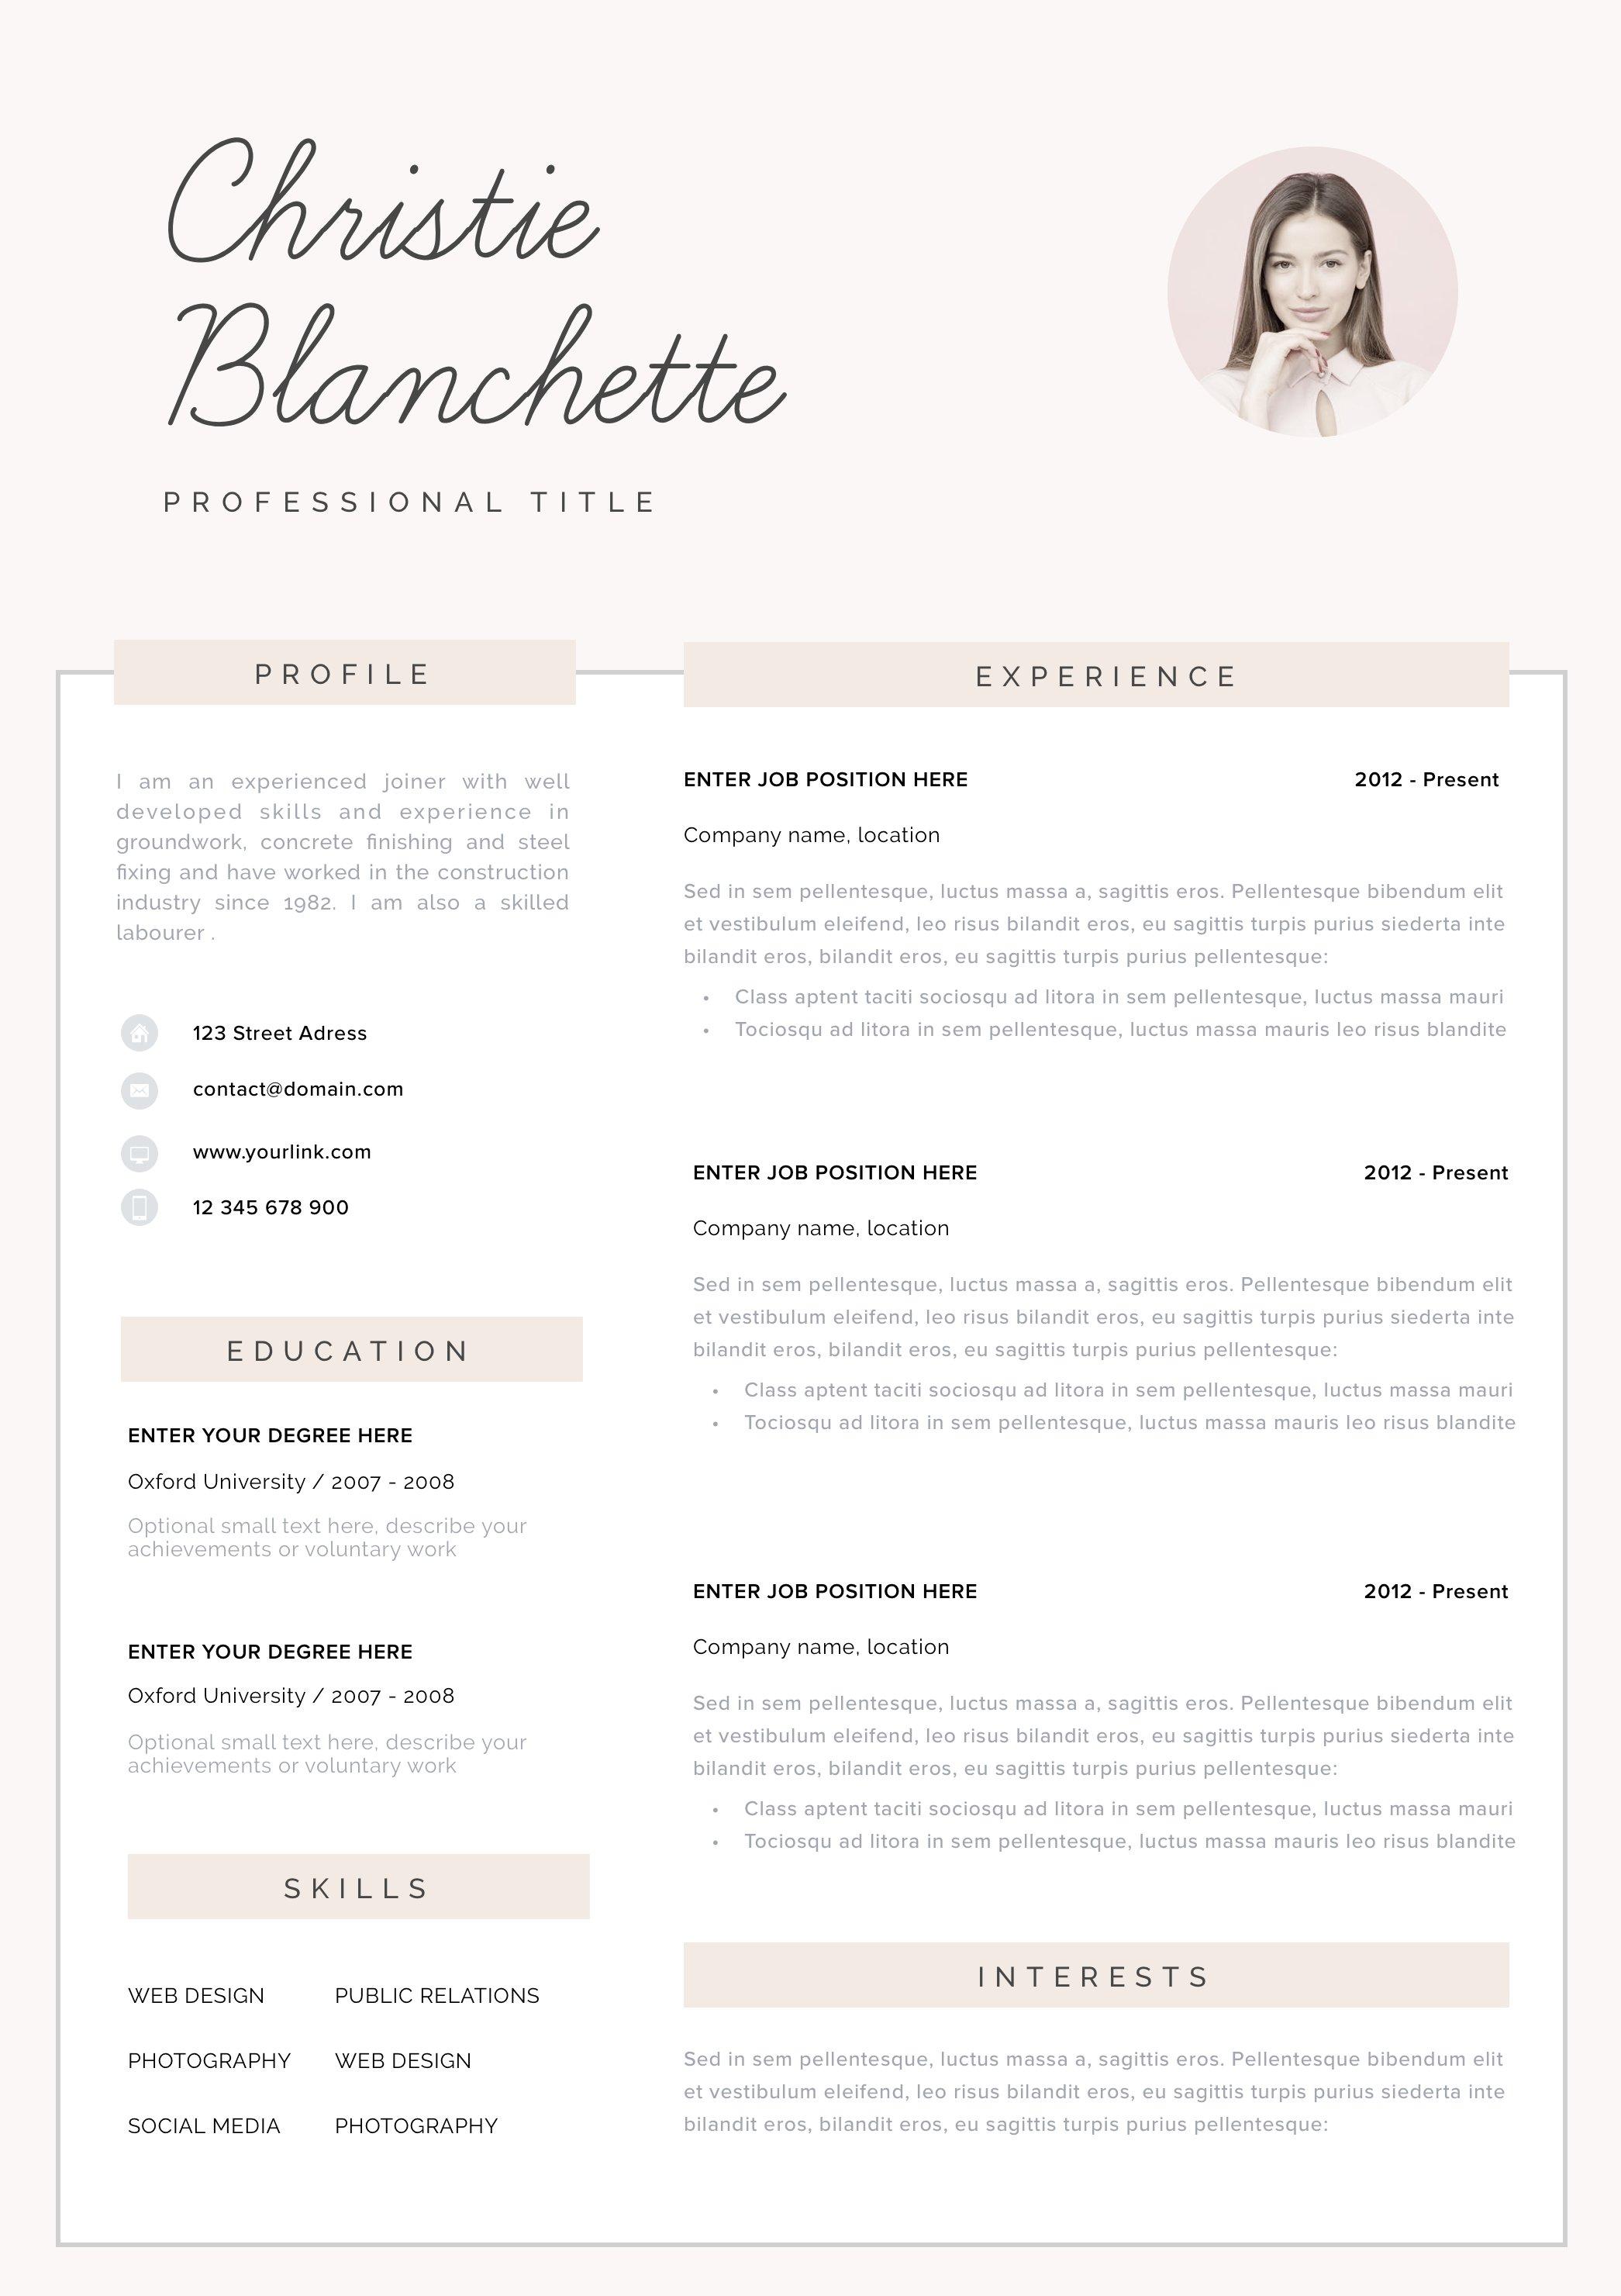 Resume template cv template